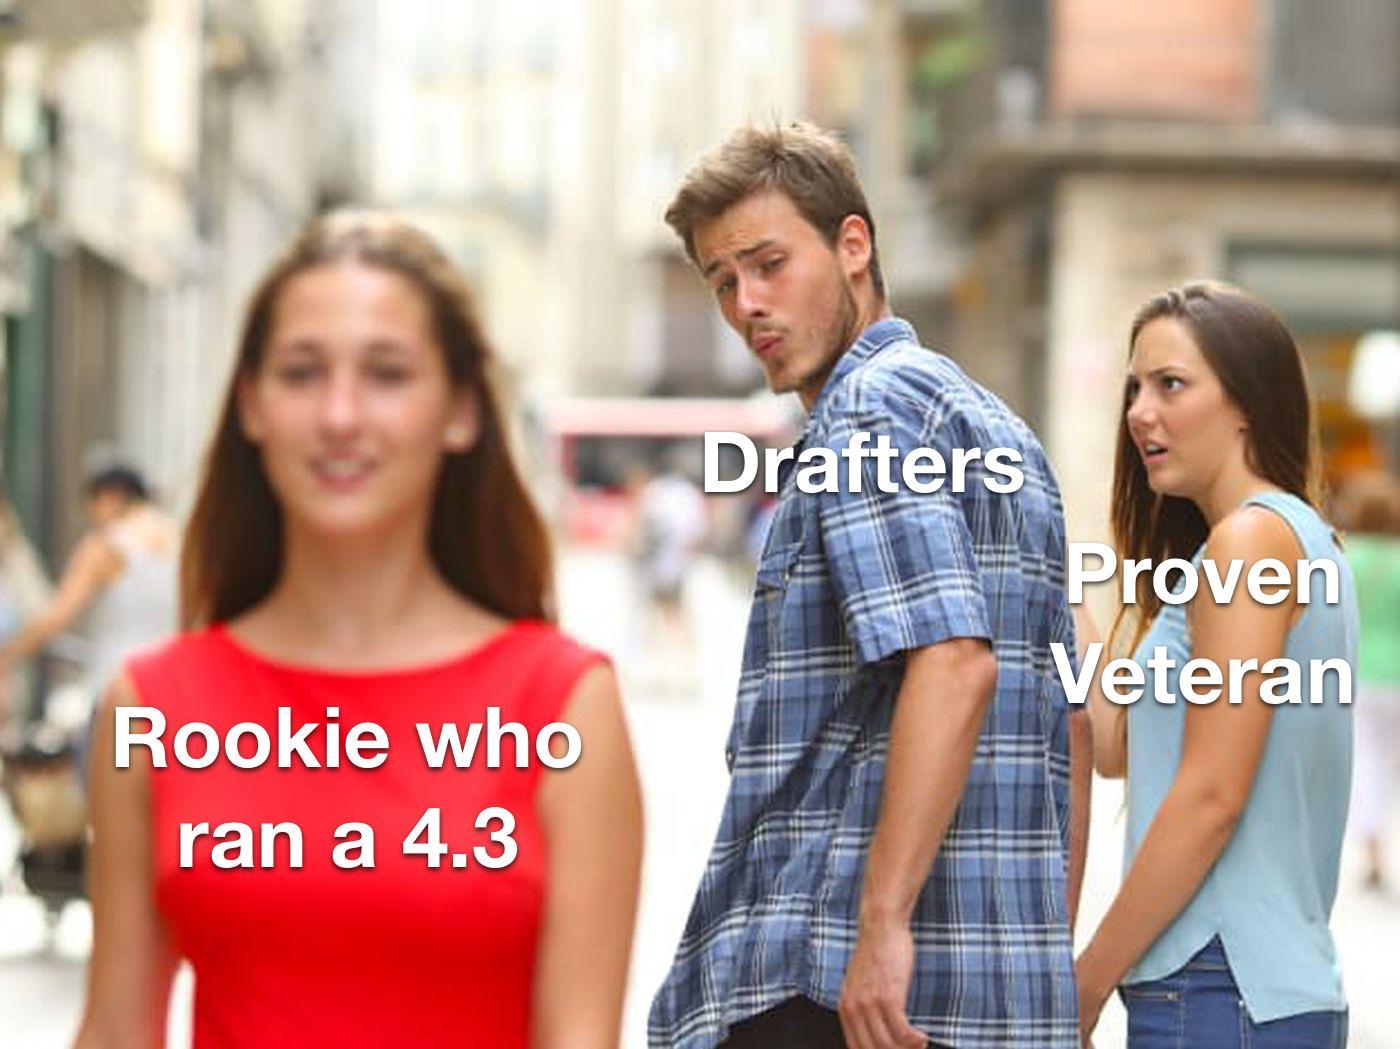 Drafters%20meme.jpeg